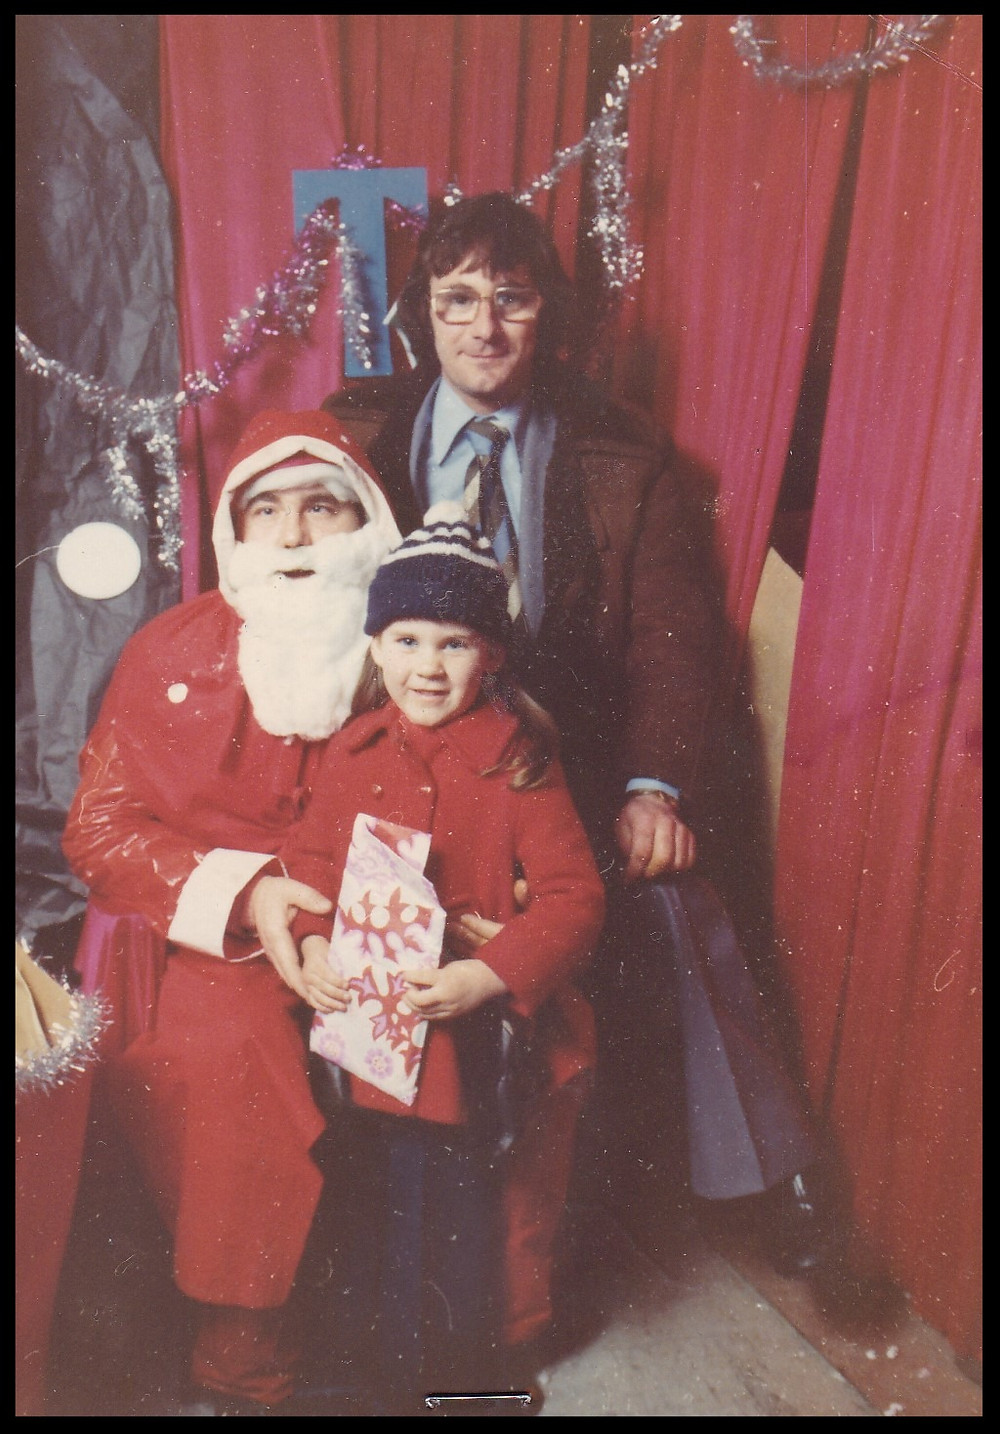 1970s Santa Clause